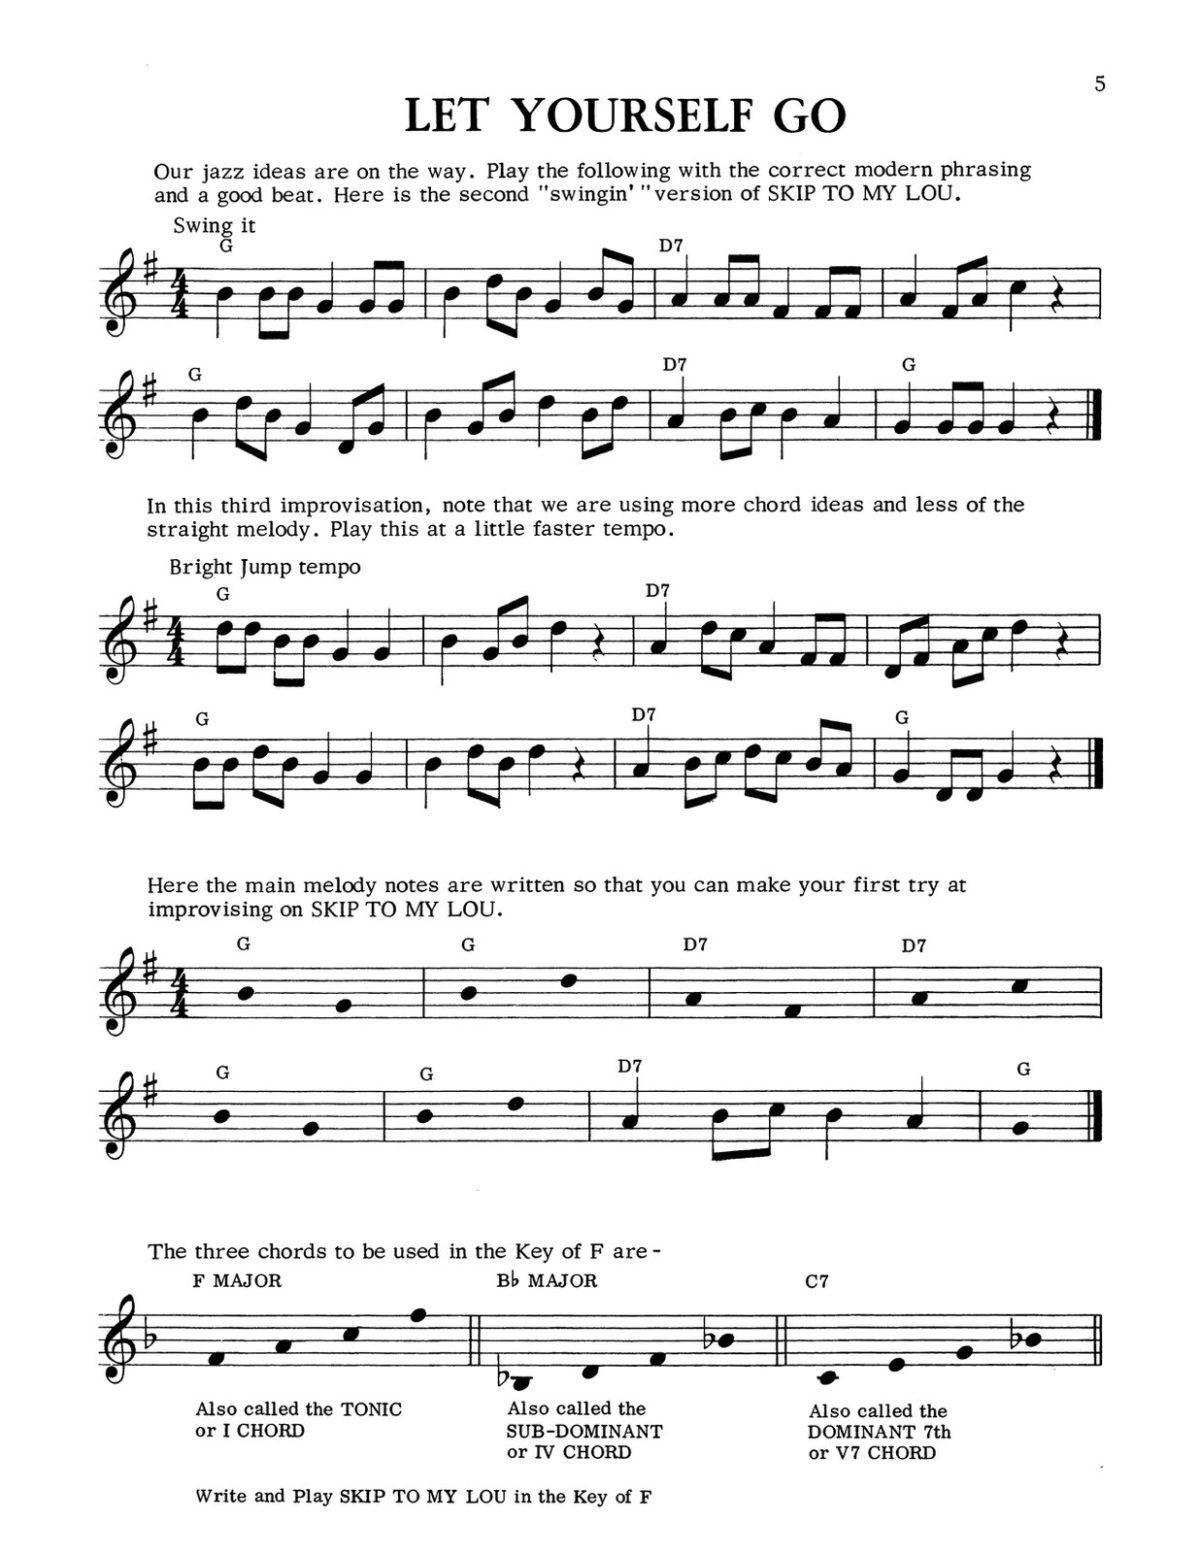 Gornston, Fun With Swing for Trumpet-p09